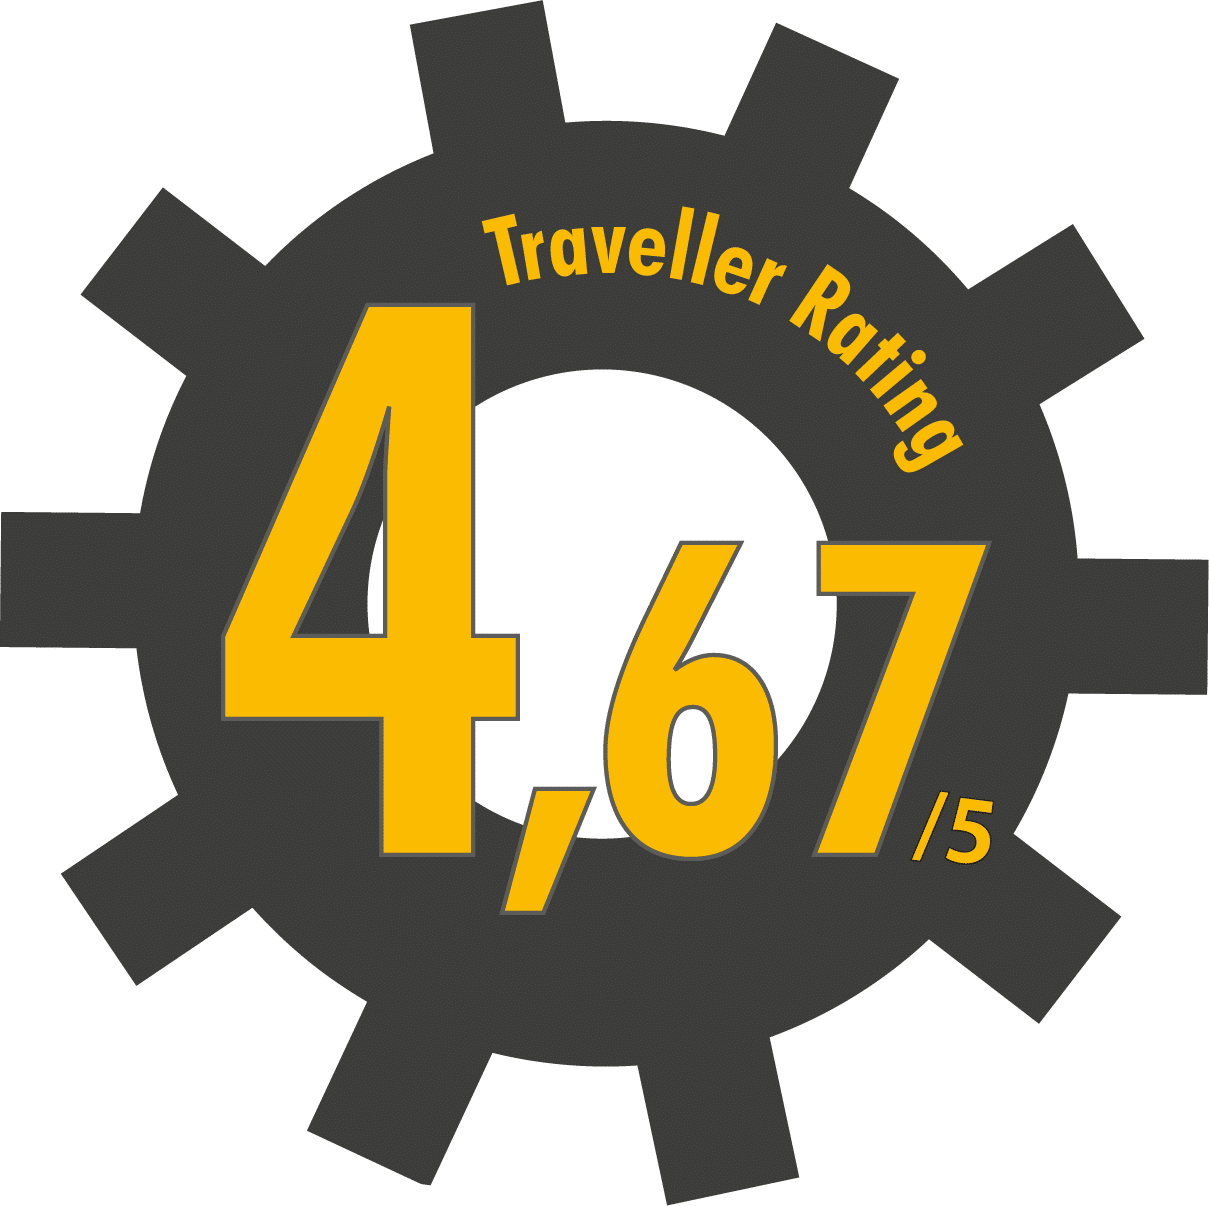 Traveller Rating ABT 10